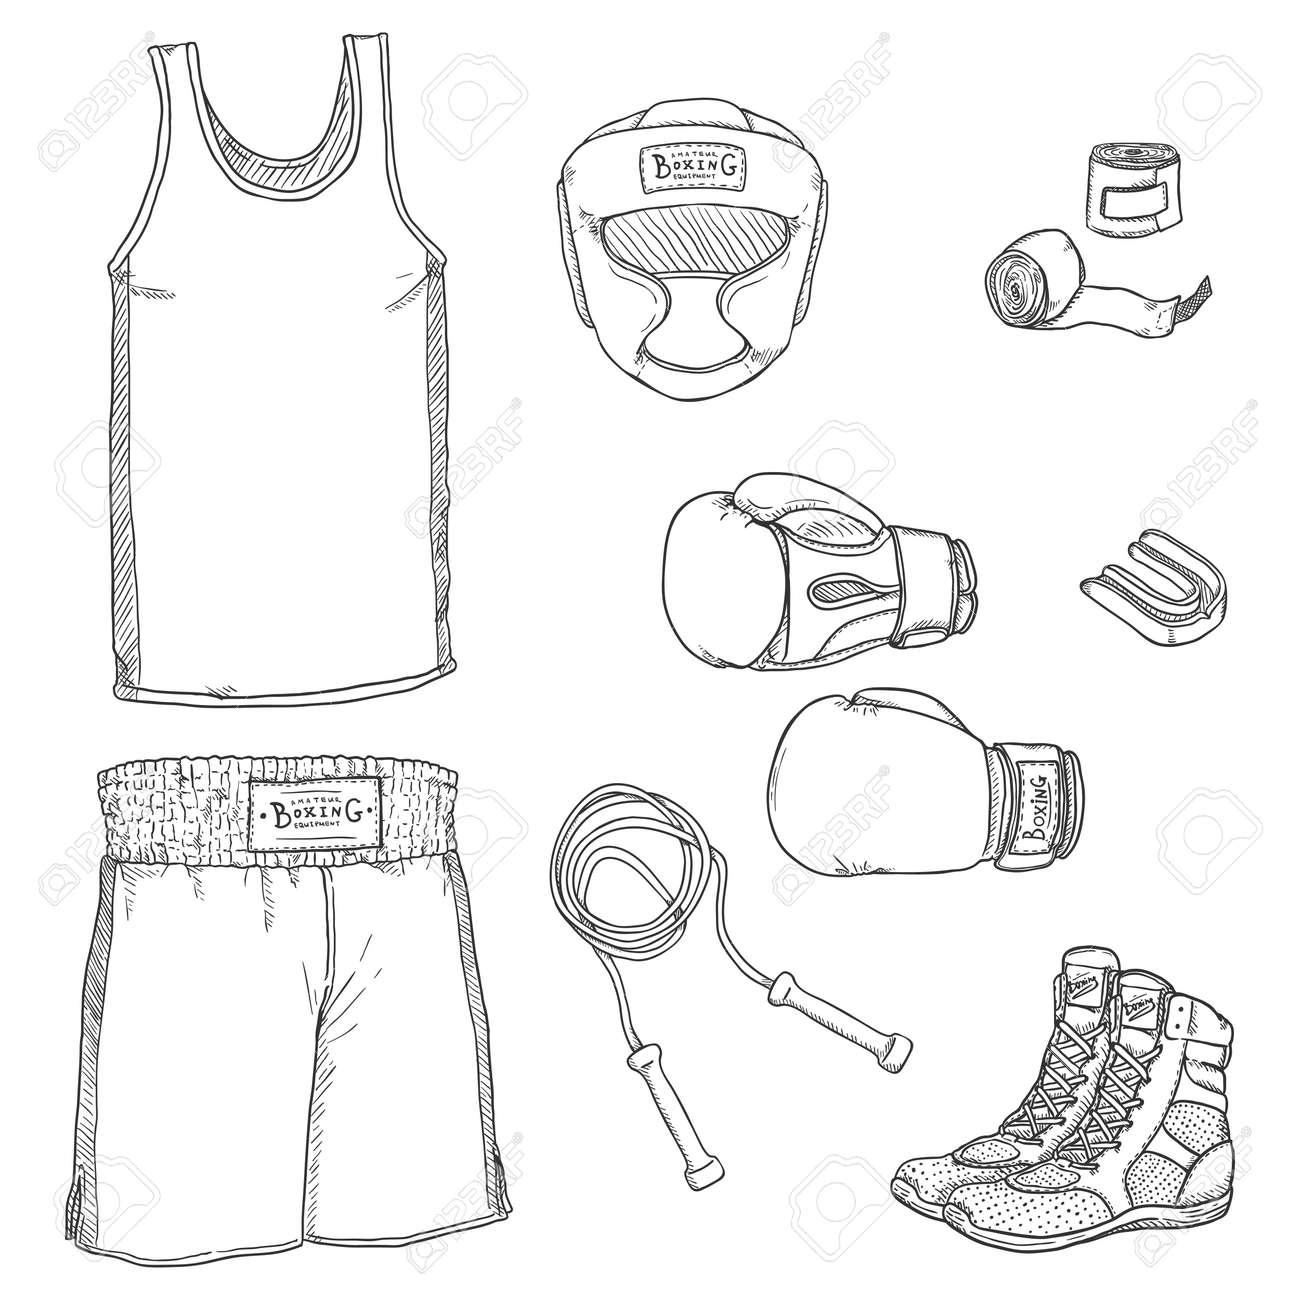 Sketch Boxing Equipment. Hand Drawn Illustrations Set - 168798651